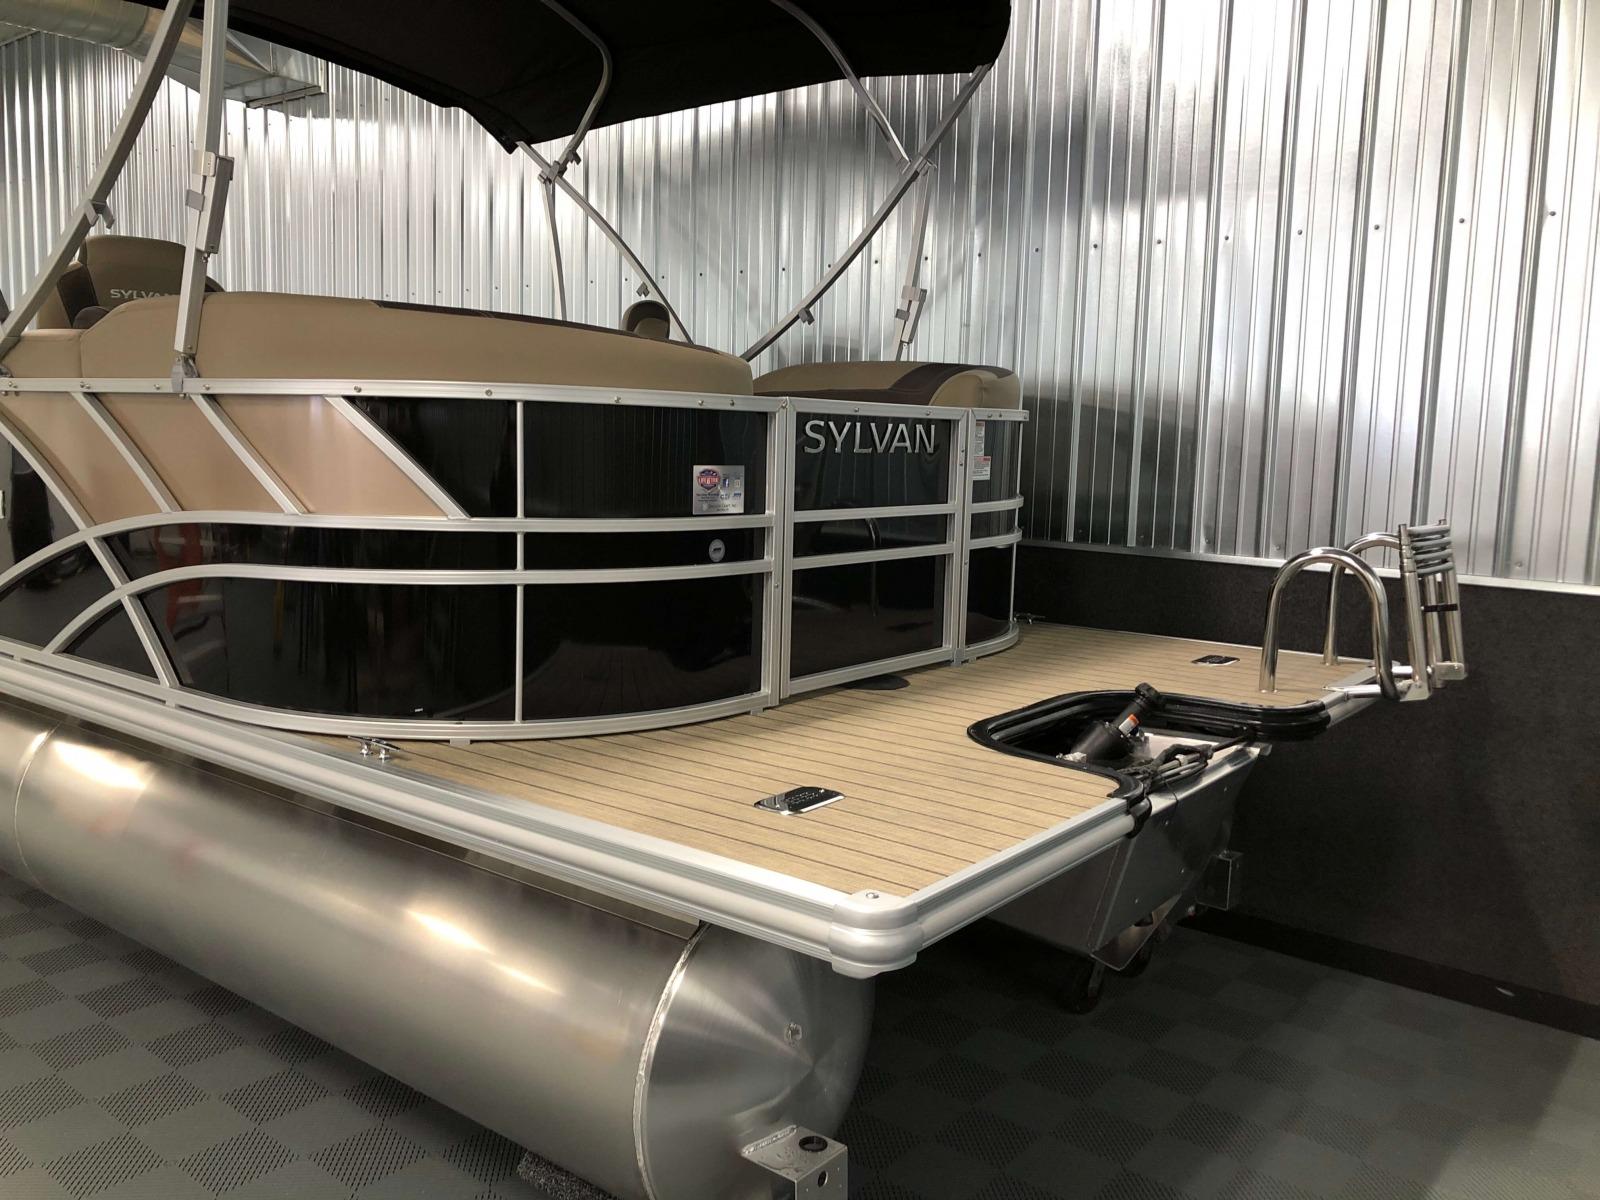 Extended Rear Swim Deck of the 2021 Sylvan L1 LZ Pontoon Boat